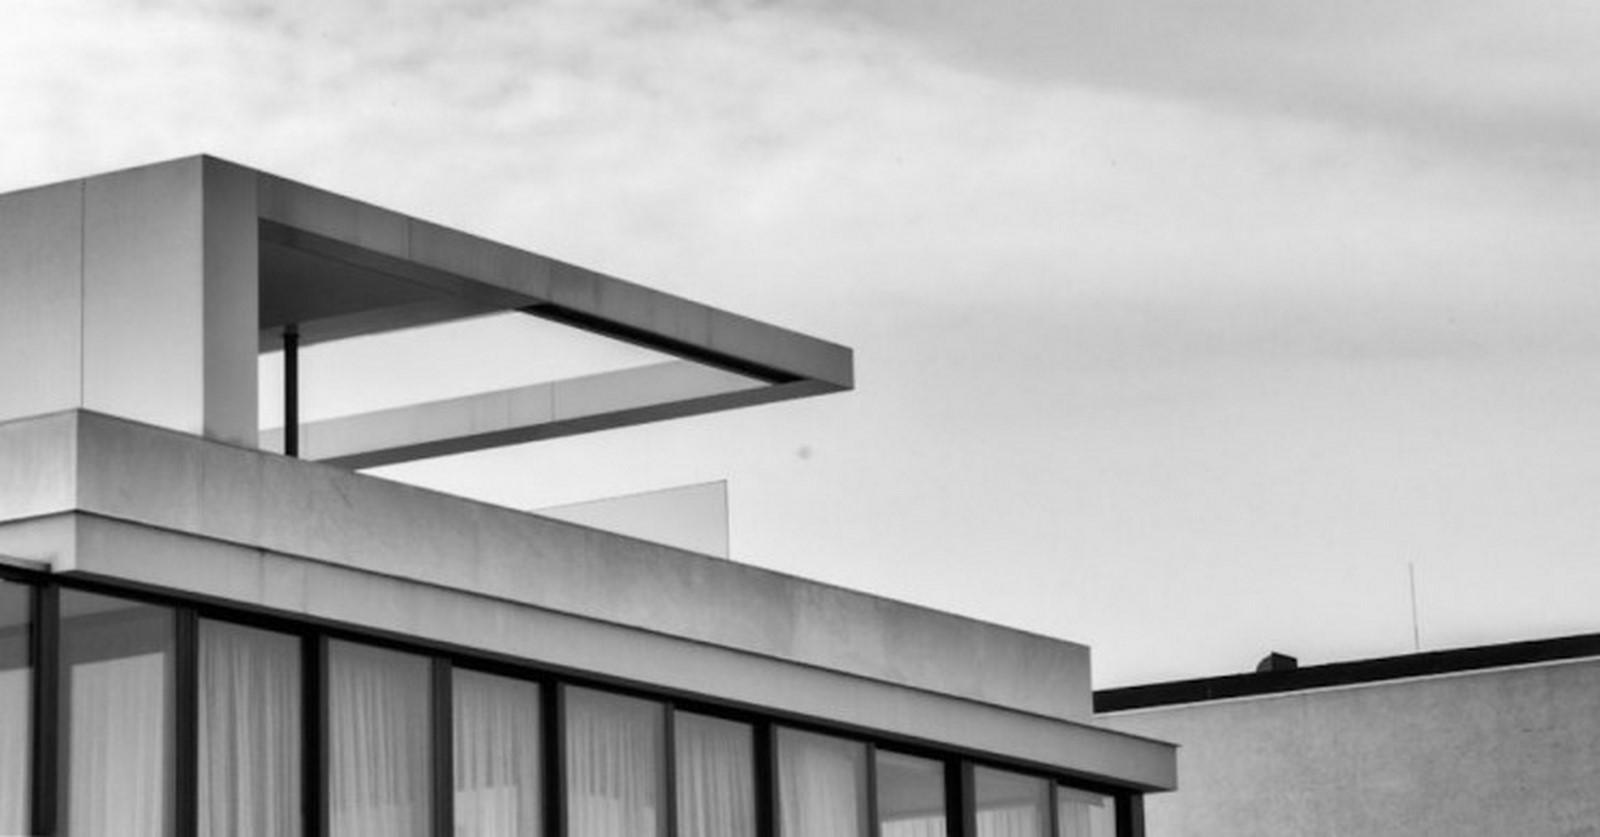 Can modern architectural techniques help us escape the concrete jungle? - sHEET1